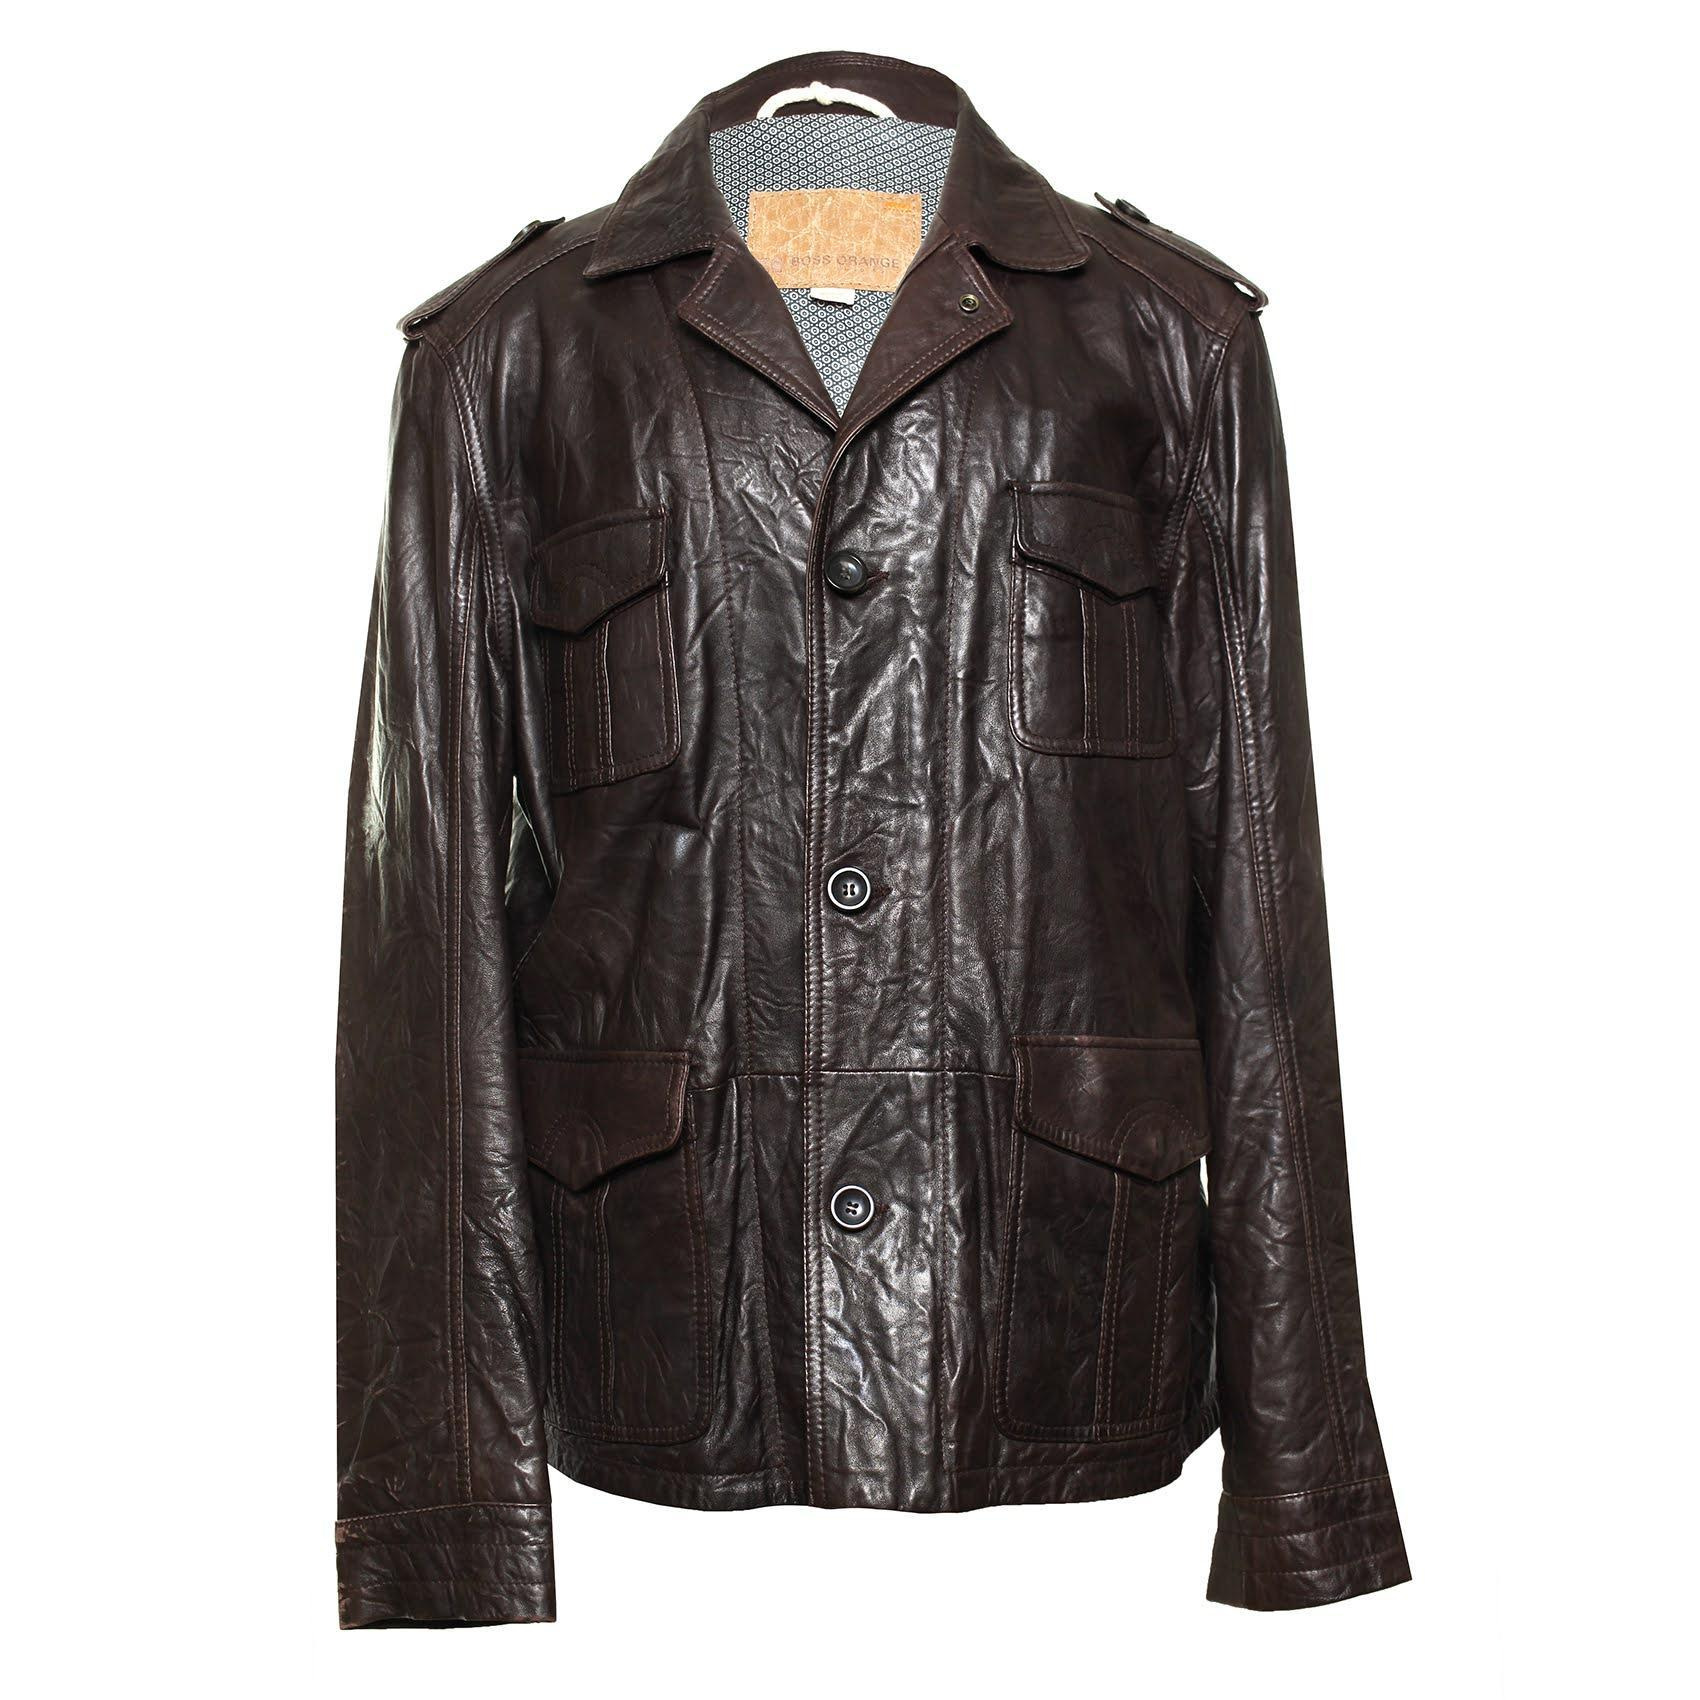 Hugo Boss Orange Size 46 Brown Leather Jacket